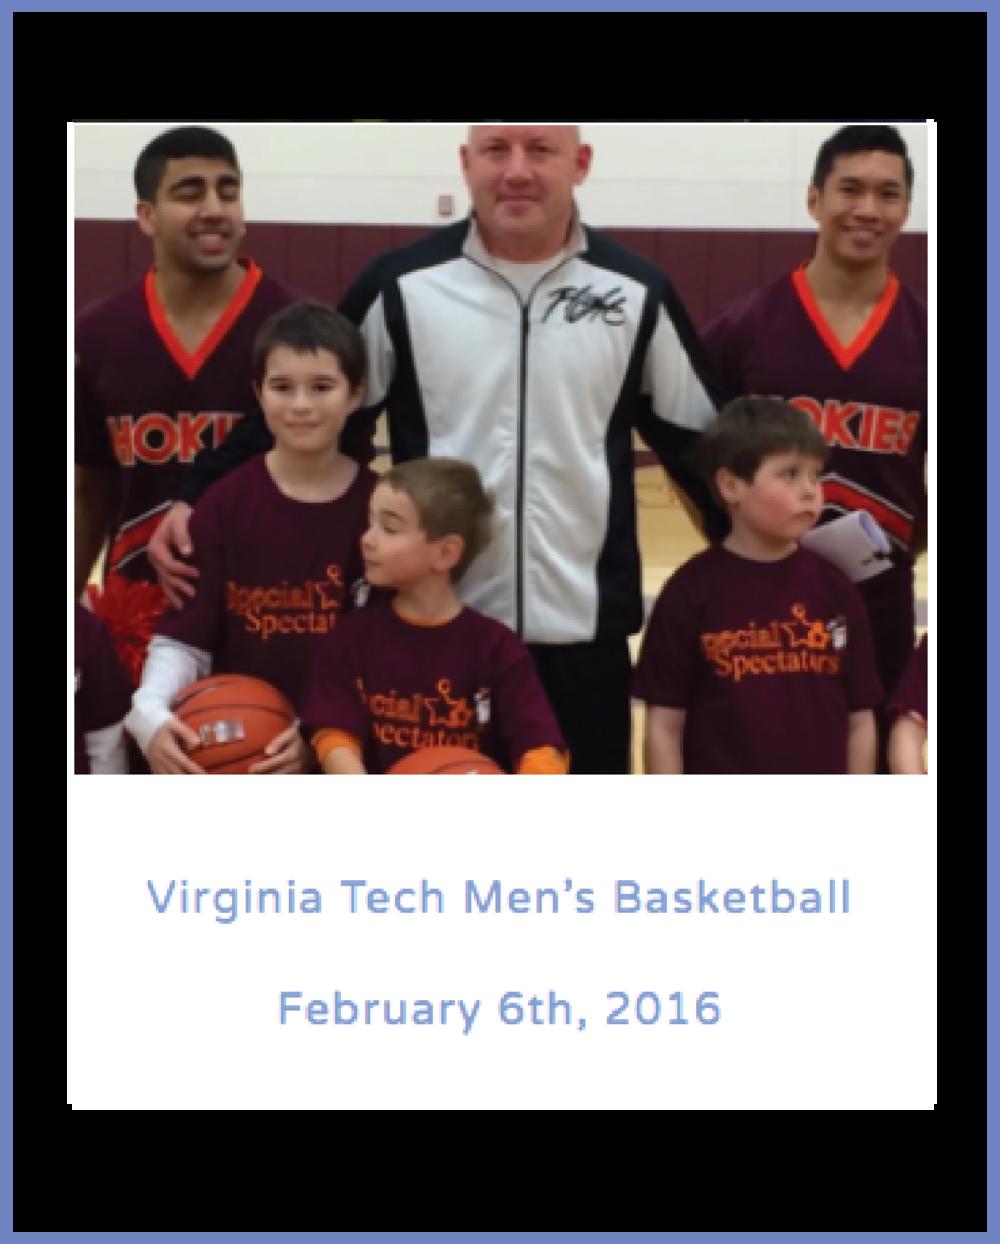 Virginia Tech Men's Basketball February 6th, 2016